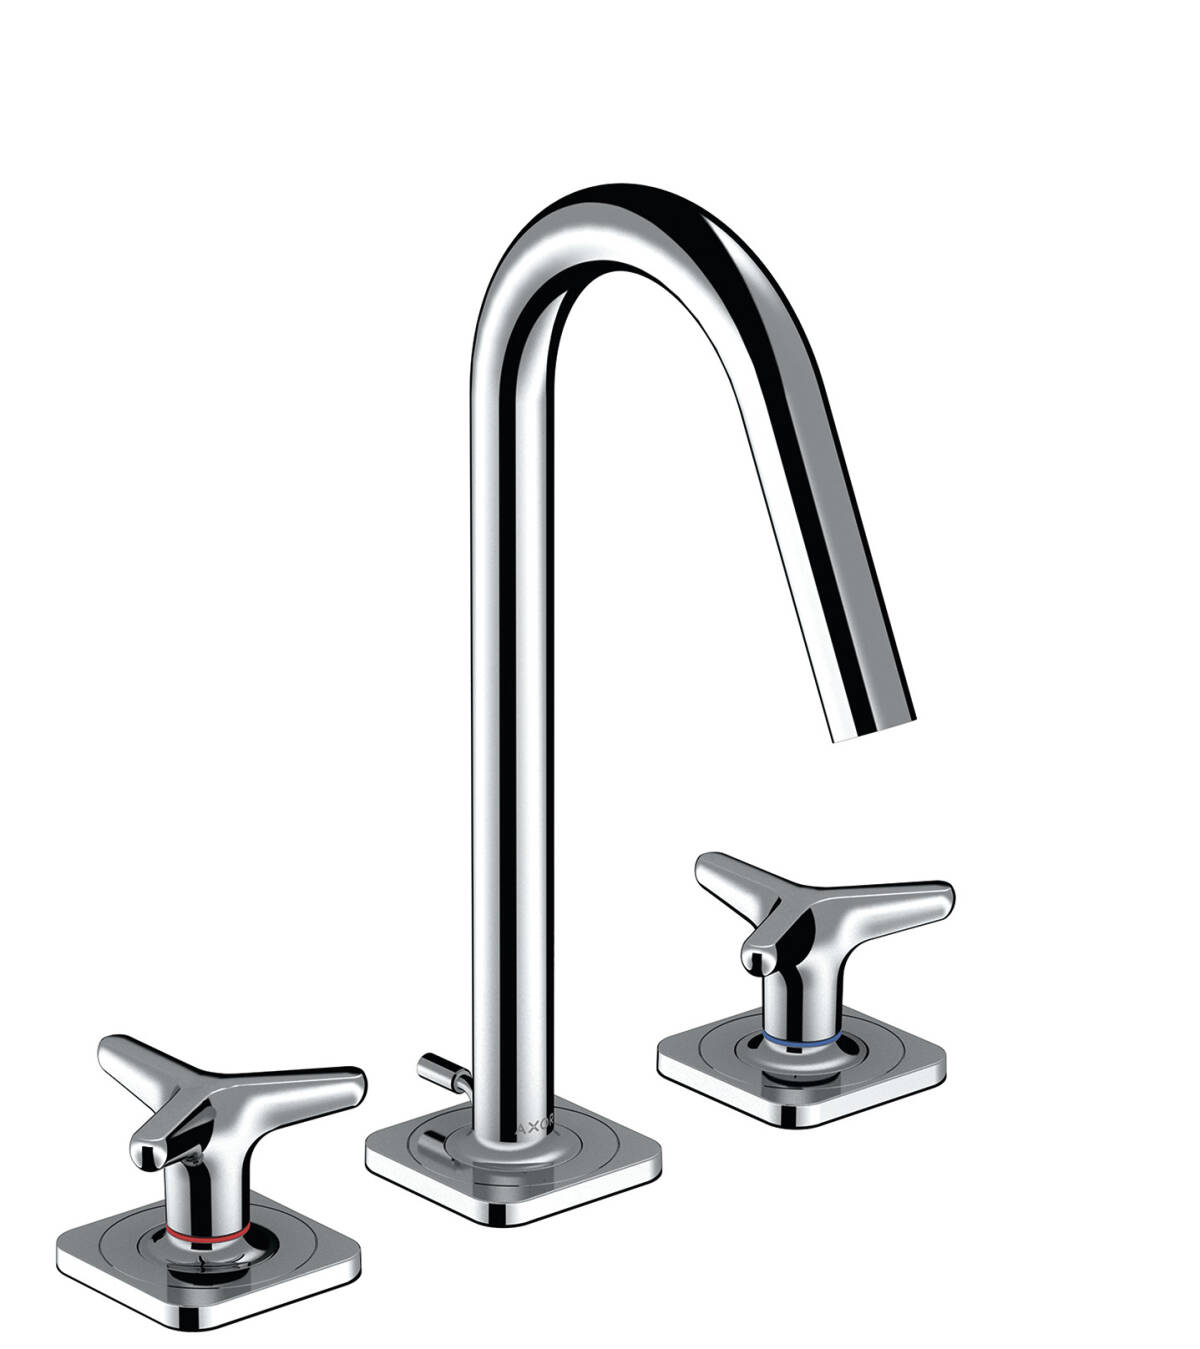 3-hole basin mixer 160 with star handles, escutcheons and pop-up waste set, Polished Chrome, 34135020